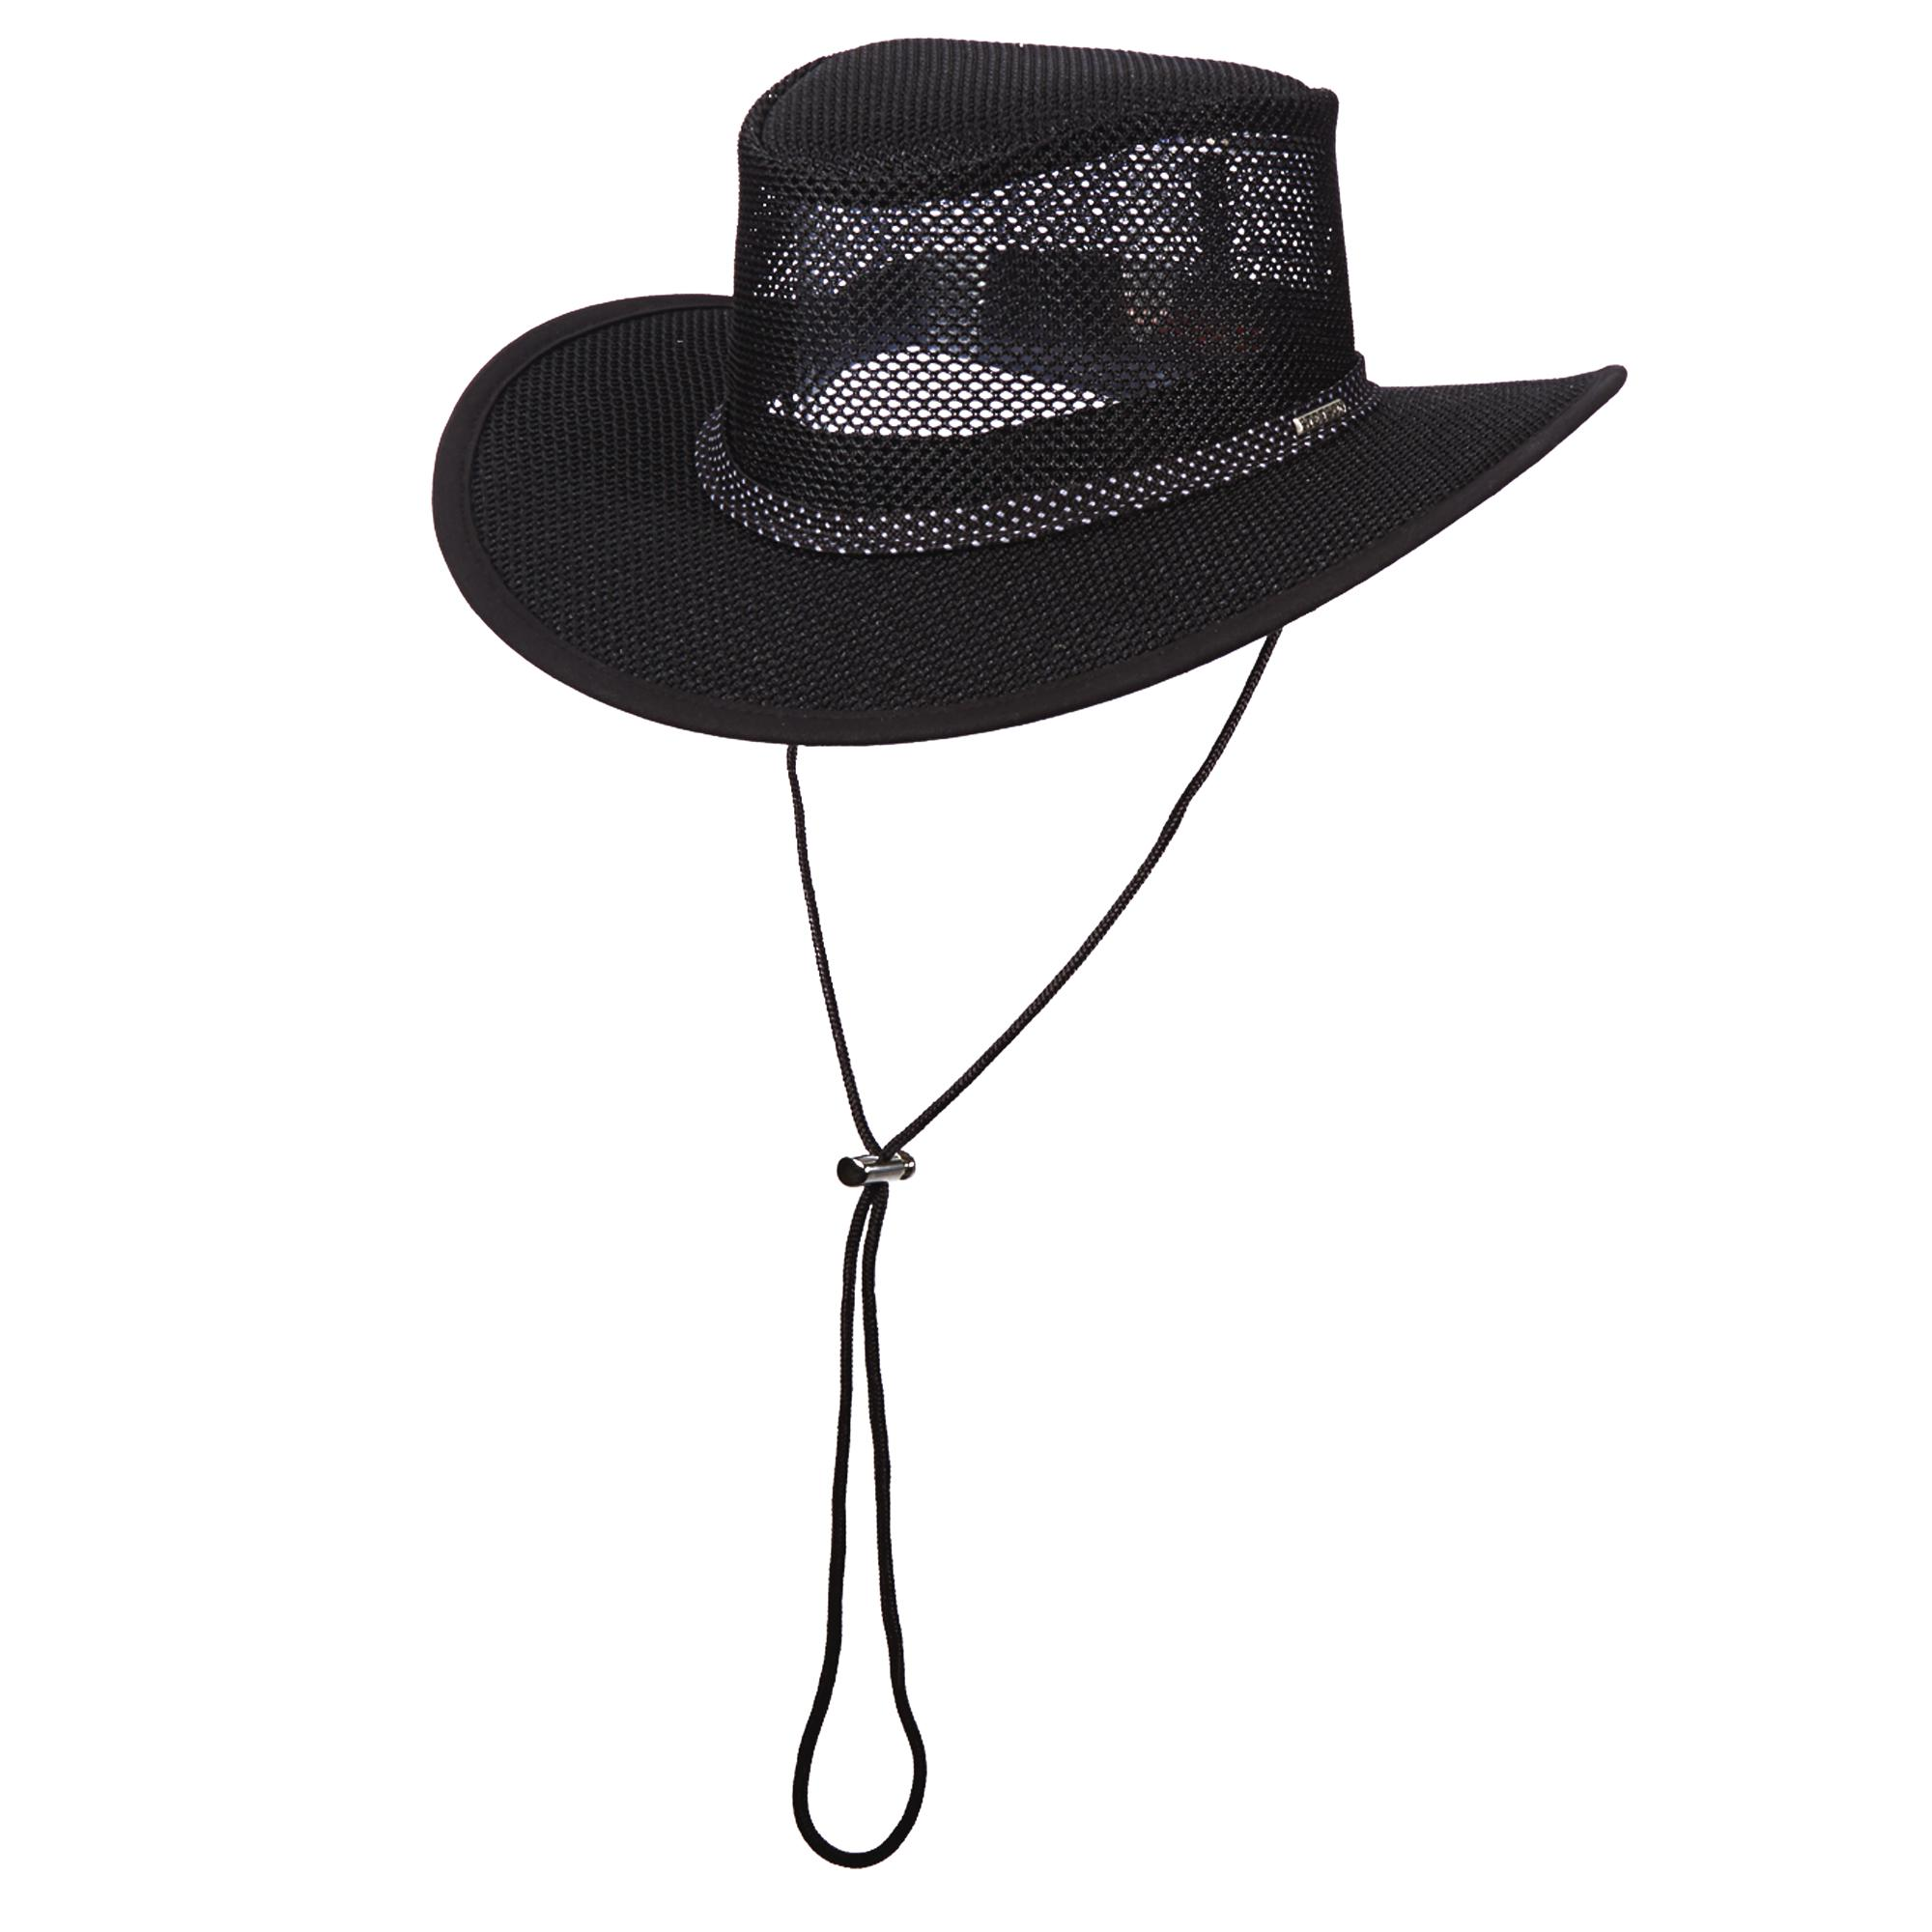 2a4b5ec15f7 Stetson Mesh Covered Safari Hat